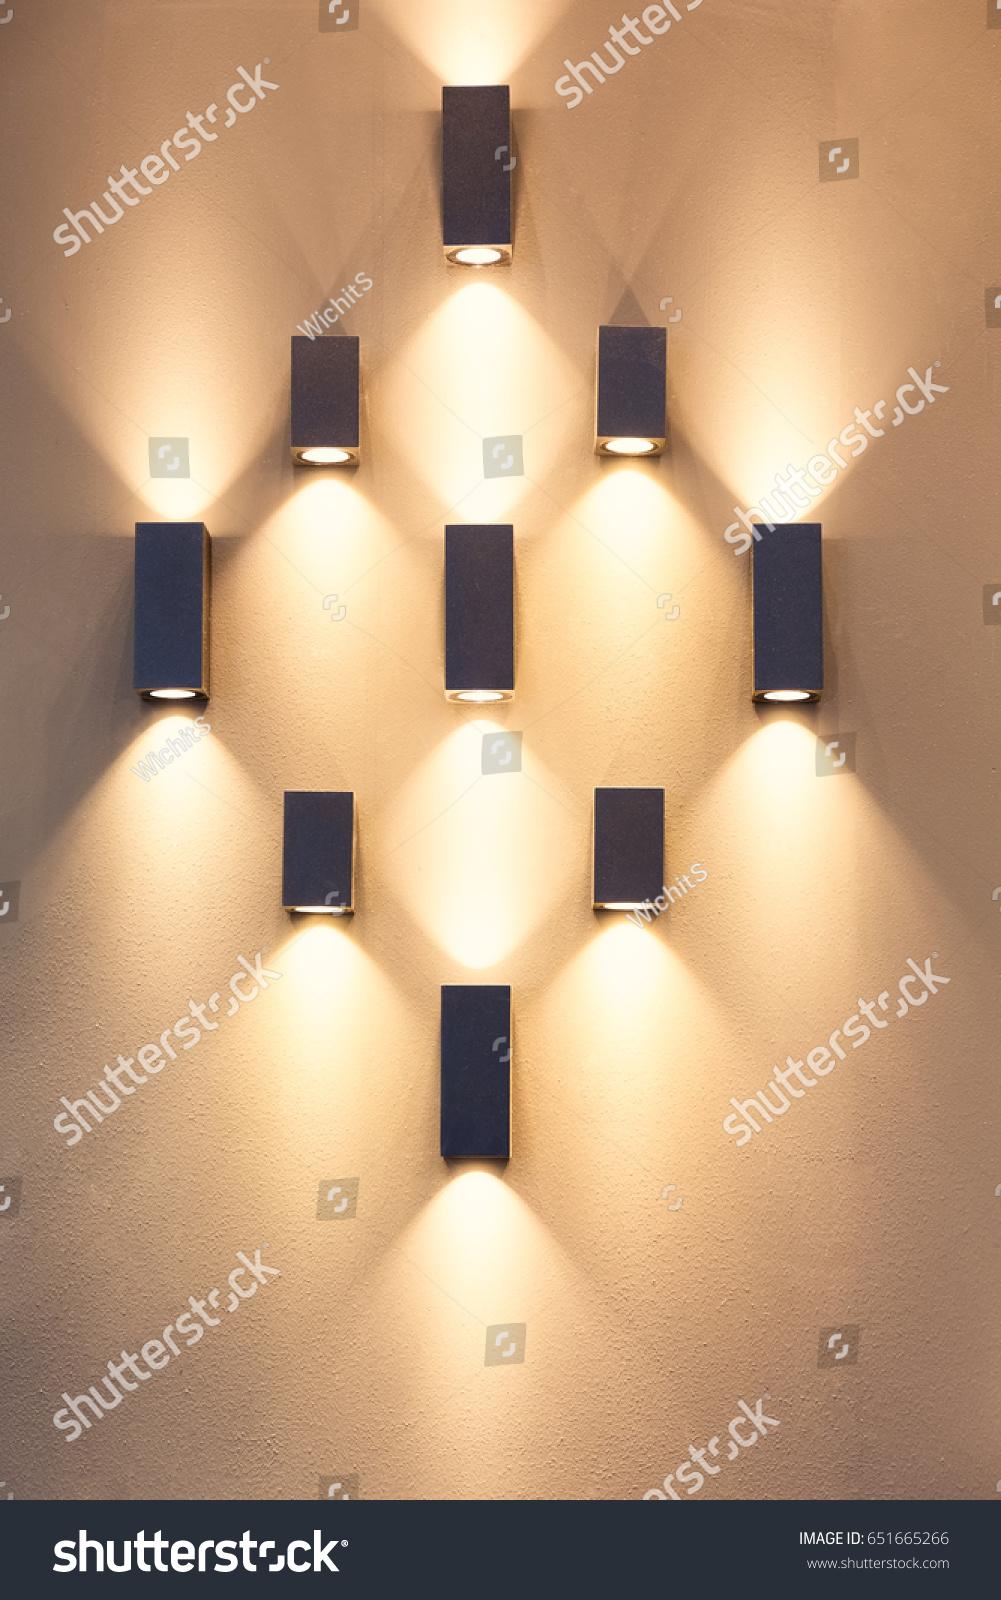 LED Decoration Lights Idea On Wall Stock Photo (Royalty Free ...